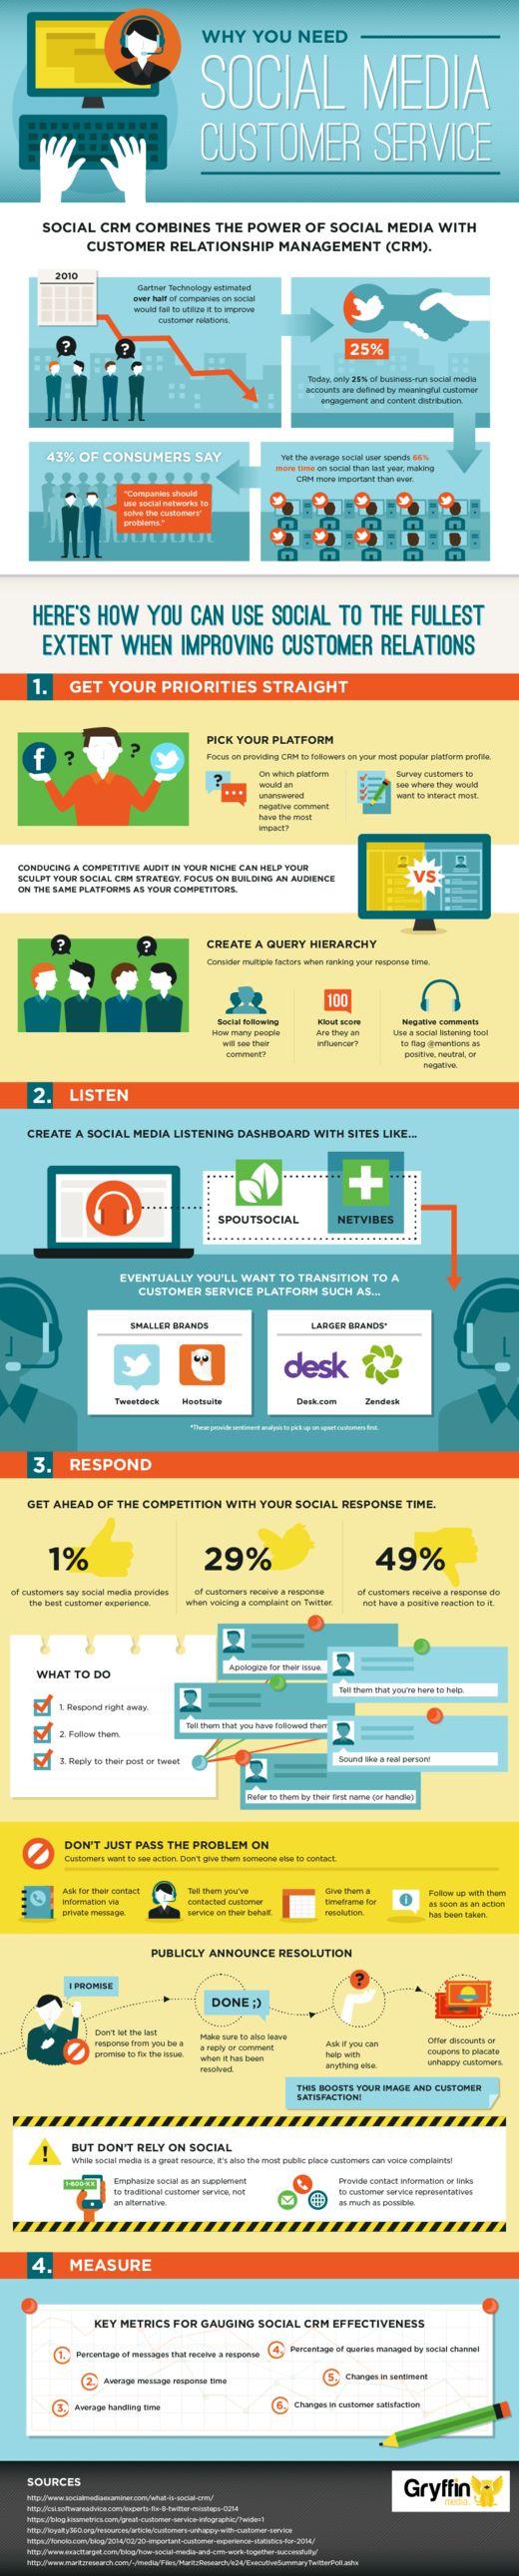 Using social media for customer relationship management. #Infographic #SMM